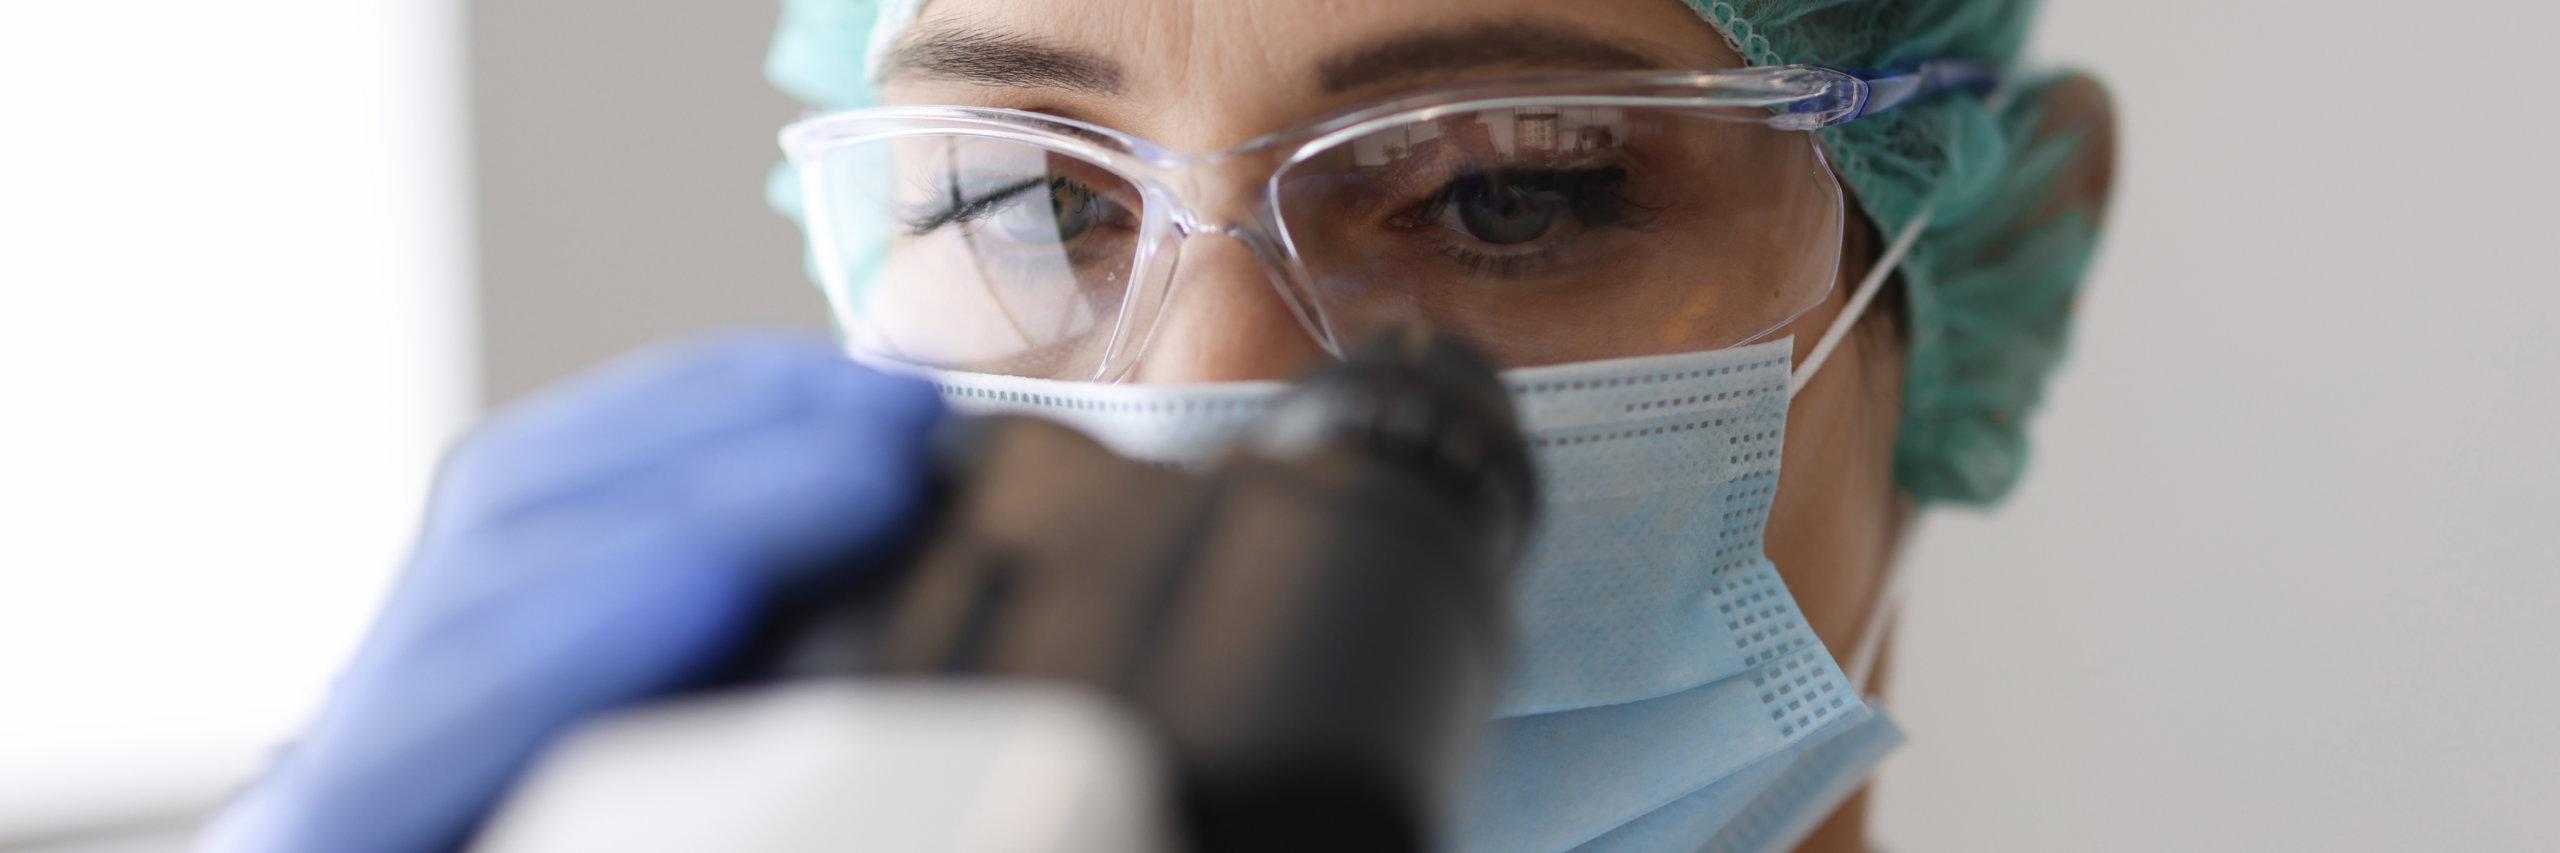 un soignant regardant dans un microscope